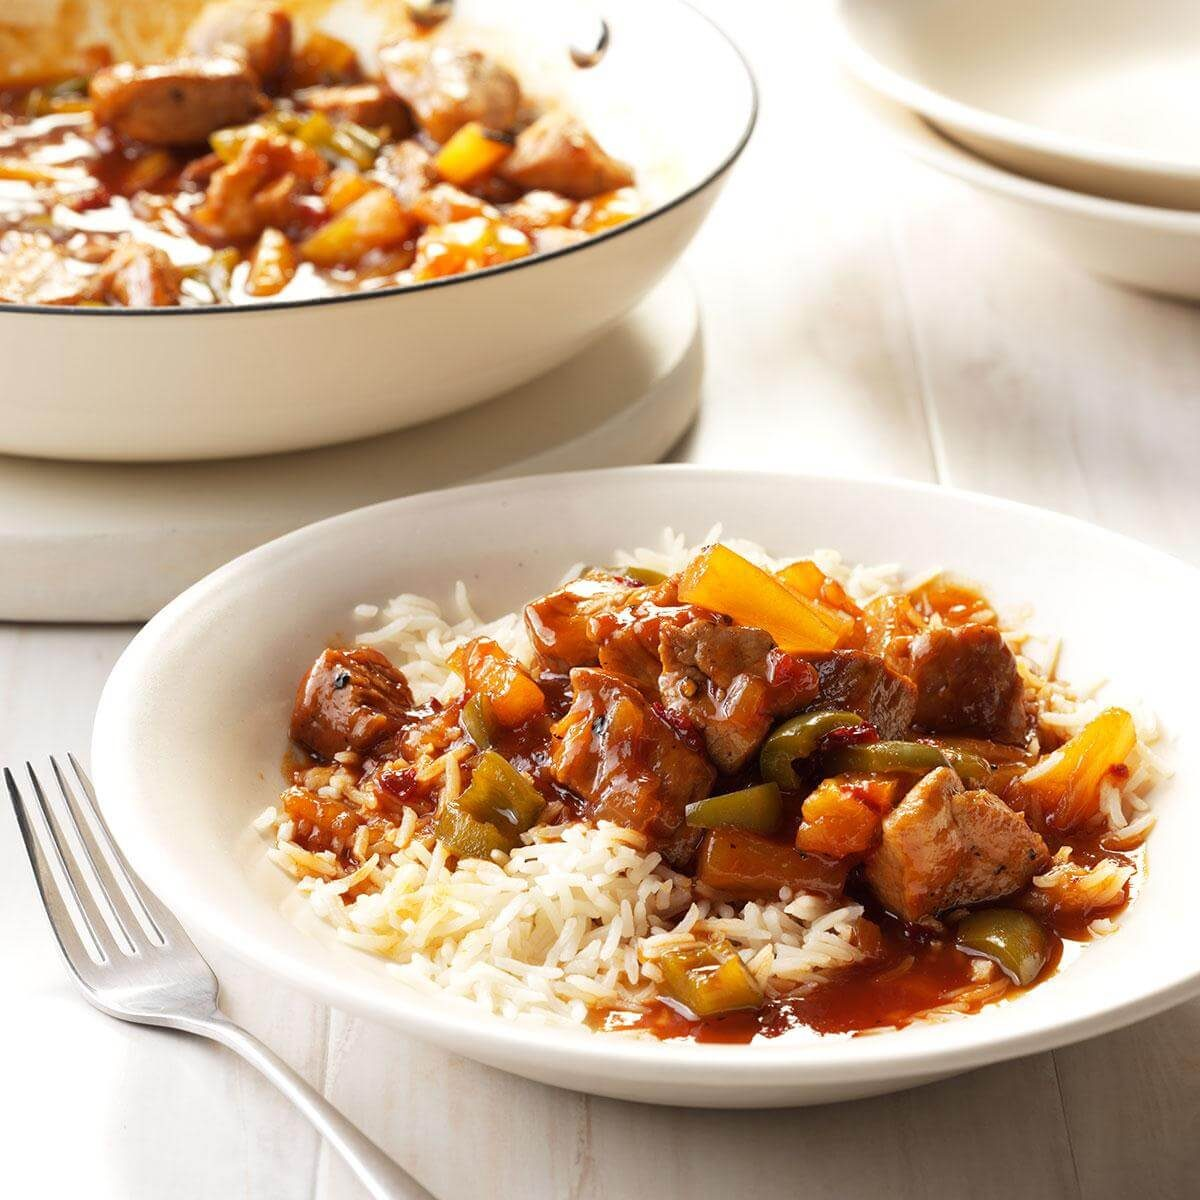 Spicy Pork Tenderloin: Tropical Sweet And Spicy Pork Tenderloin Recipe